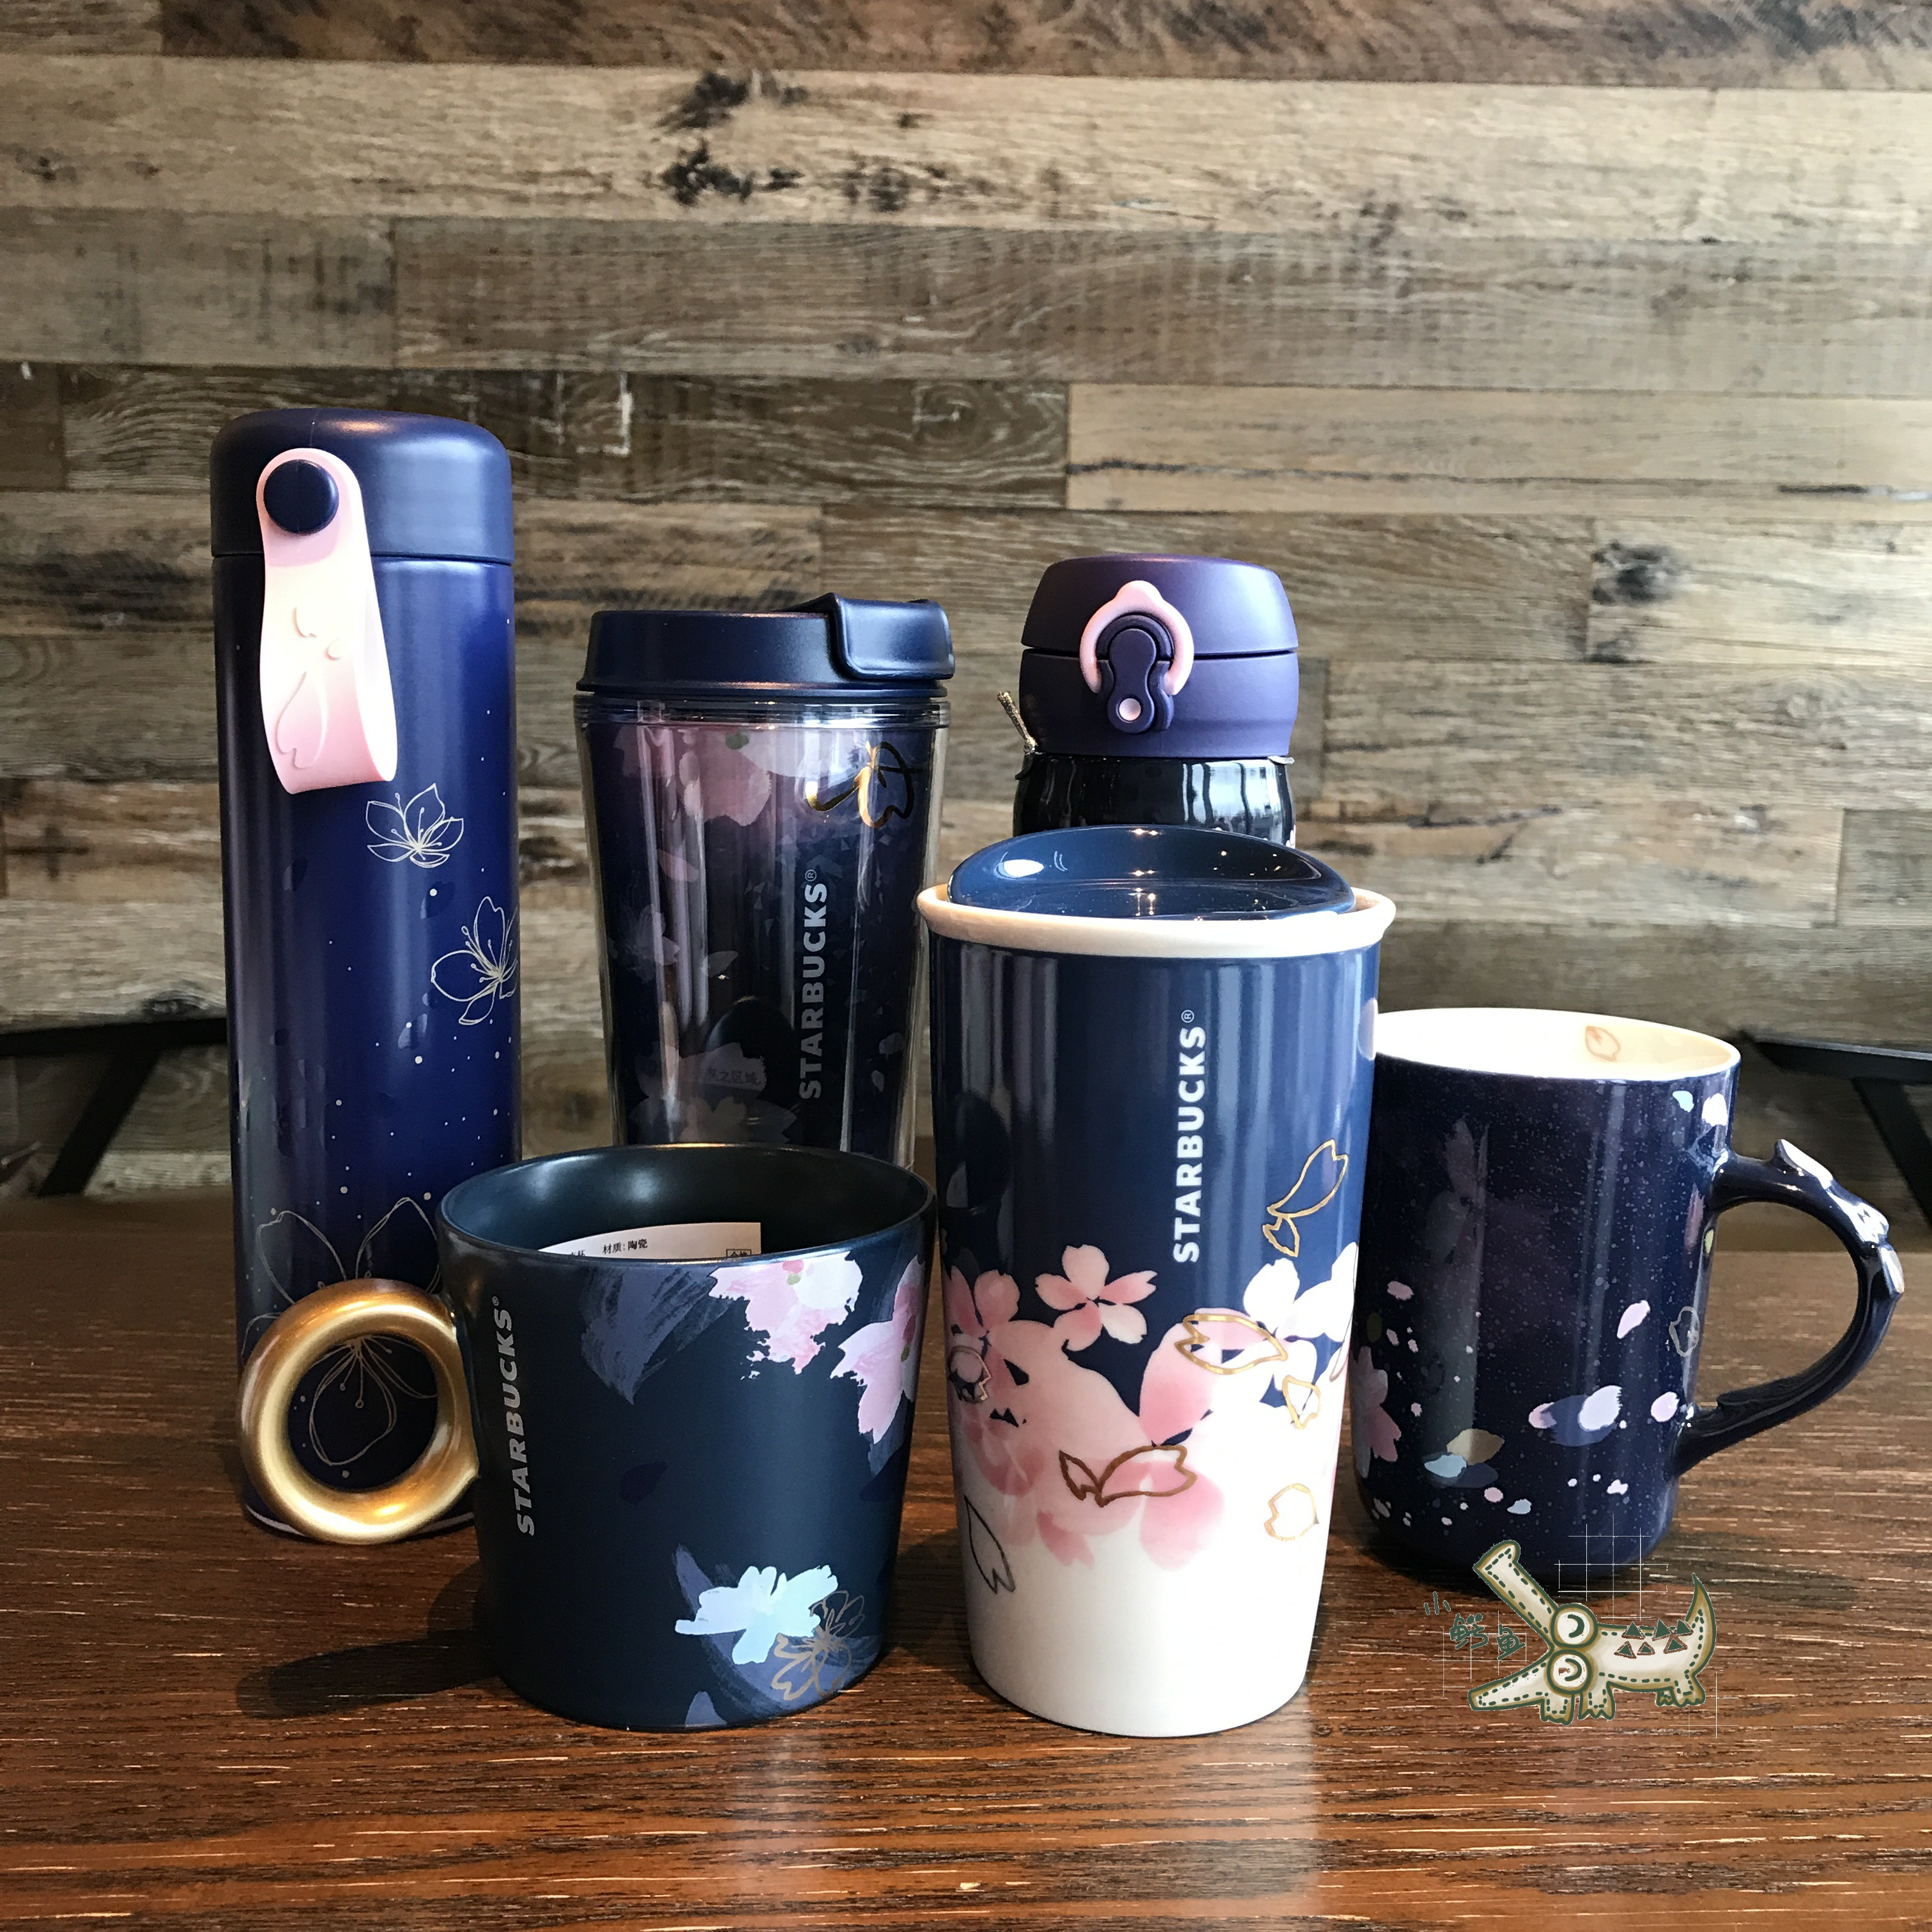 Starbucks Cup 2018 Cherry Blossom Season Colorful Romantic Day Sakura Night Sakura Stainless Steel Insulation Color Change Glass Mug